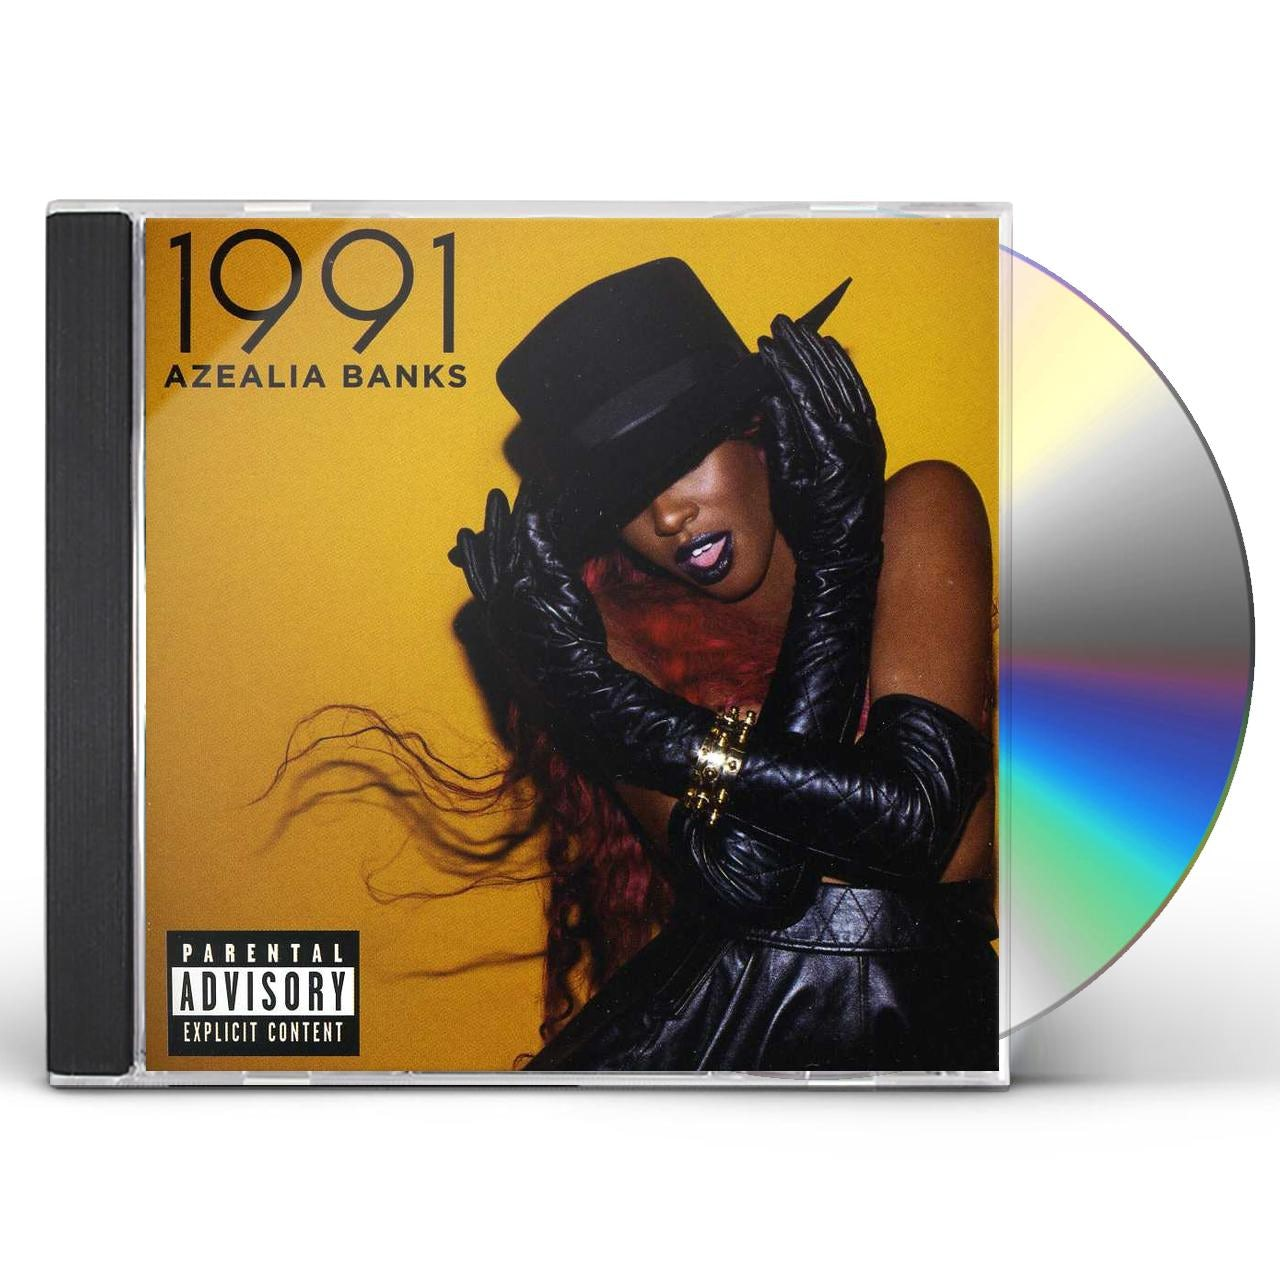 Azealia Banks 1991 CD